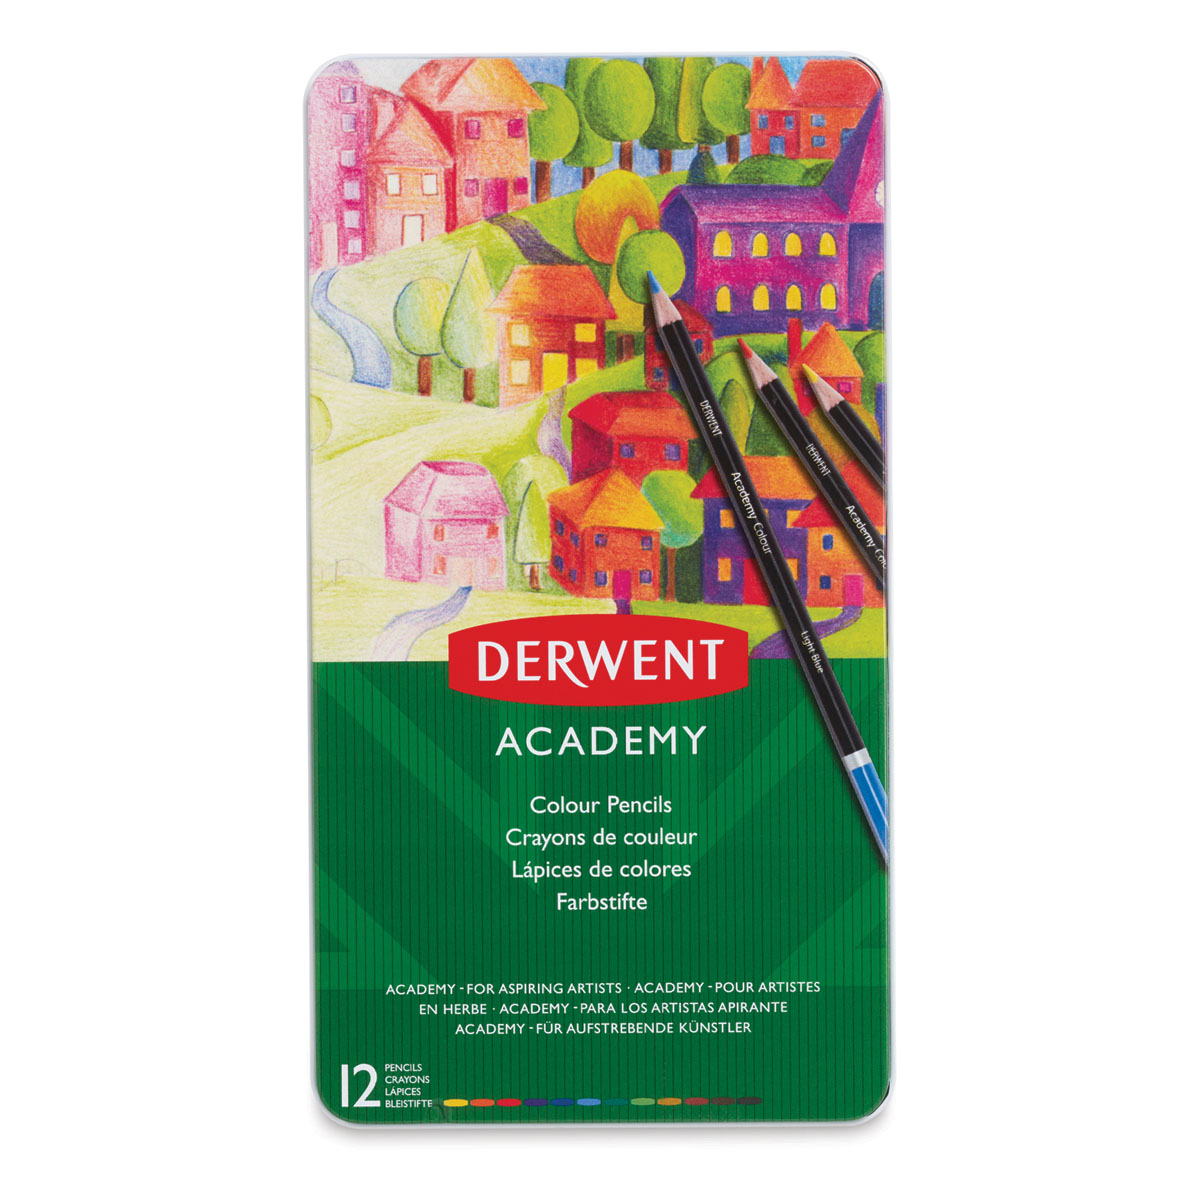 Derwent Academy Colouring Pencils tin of 24